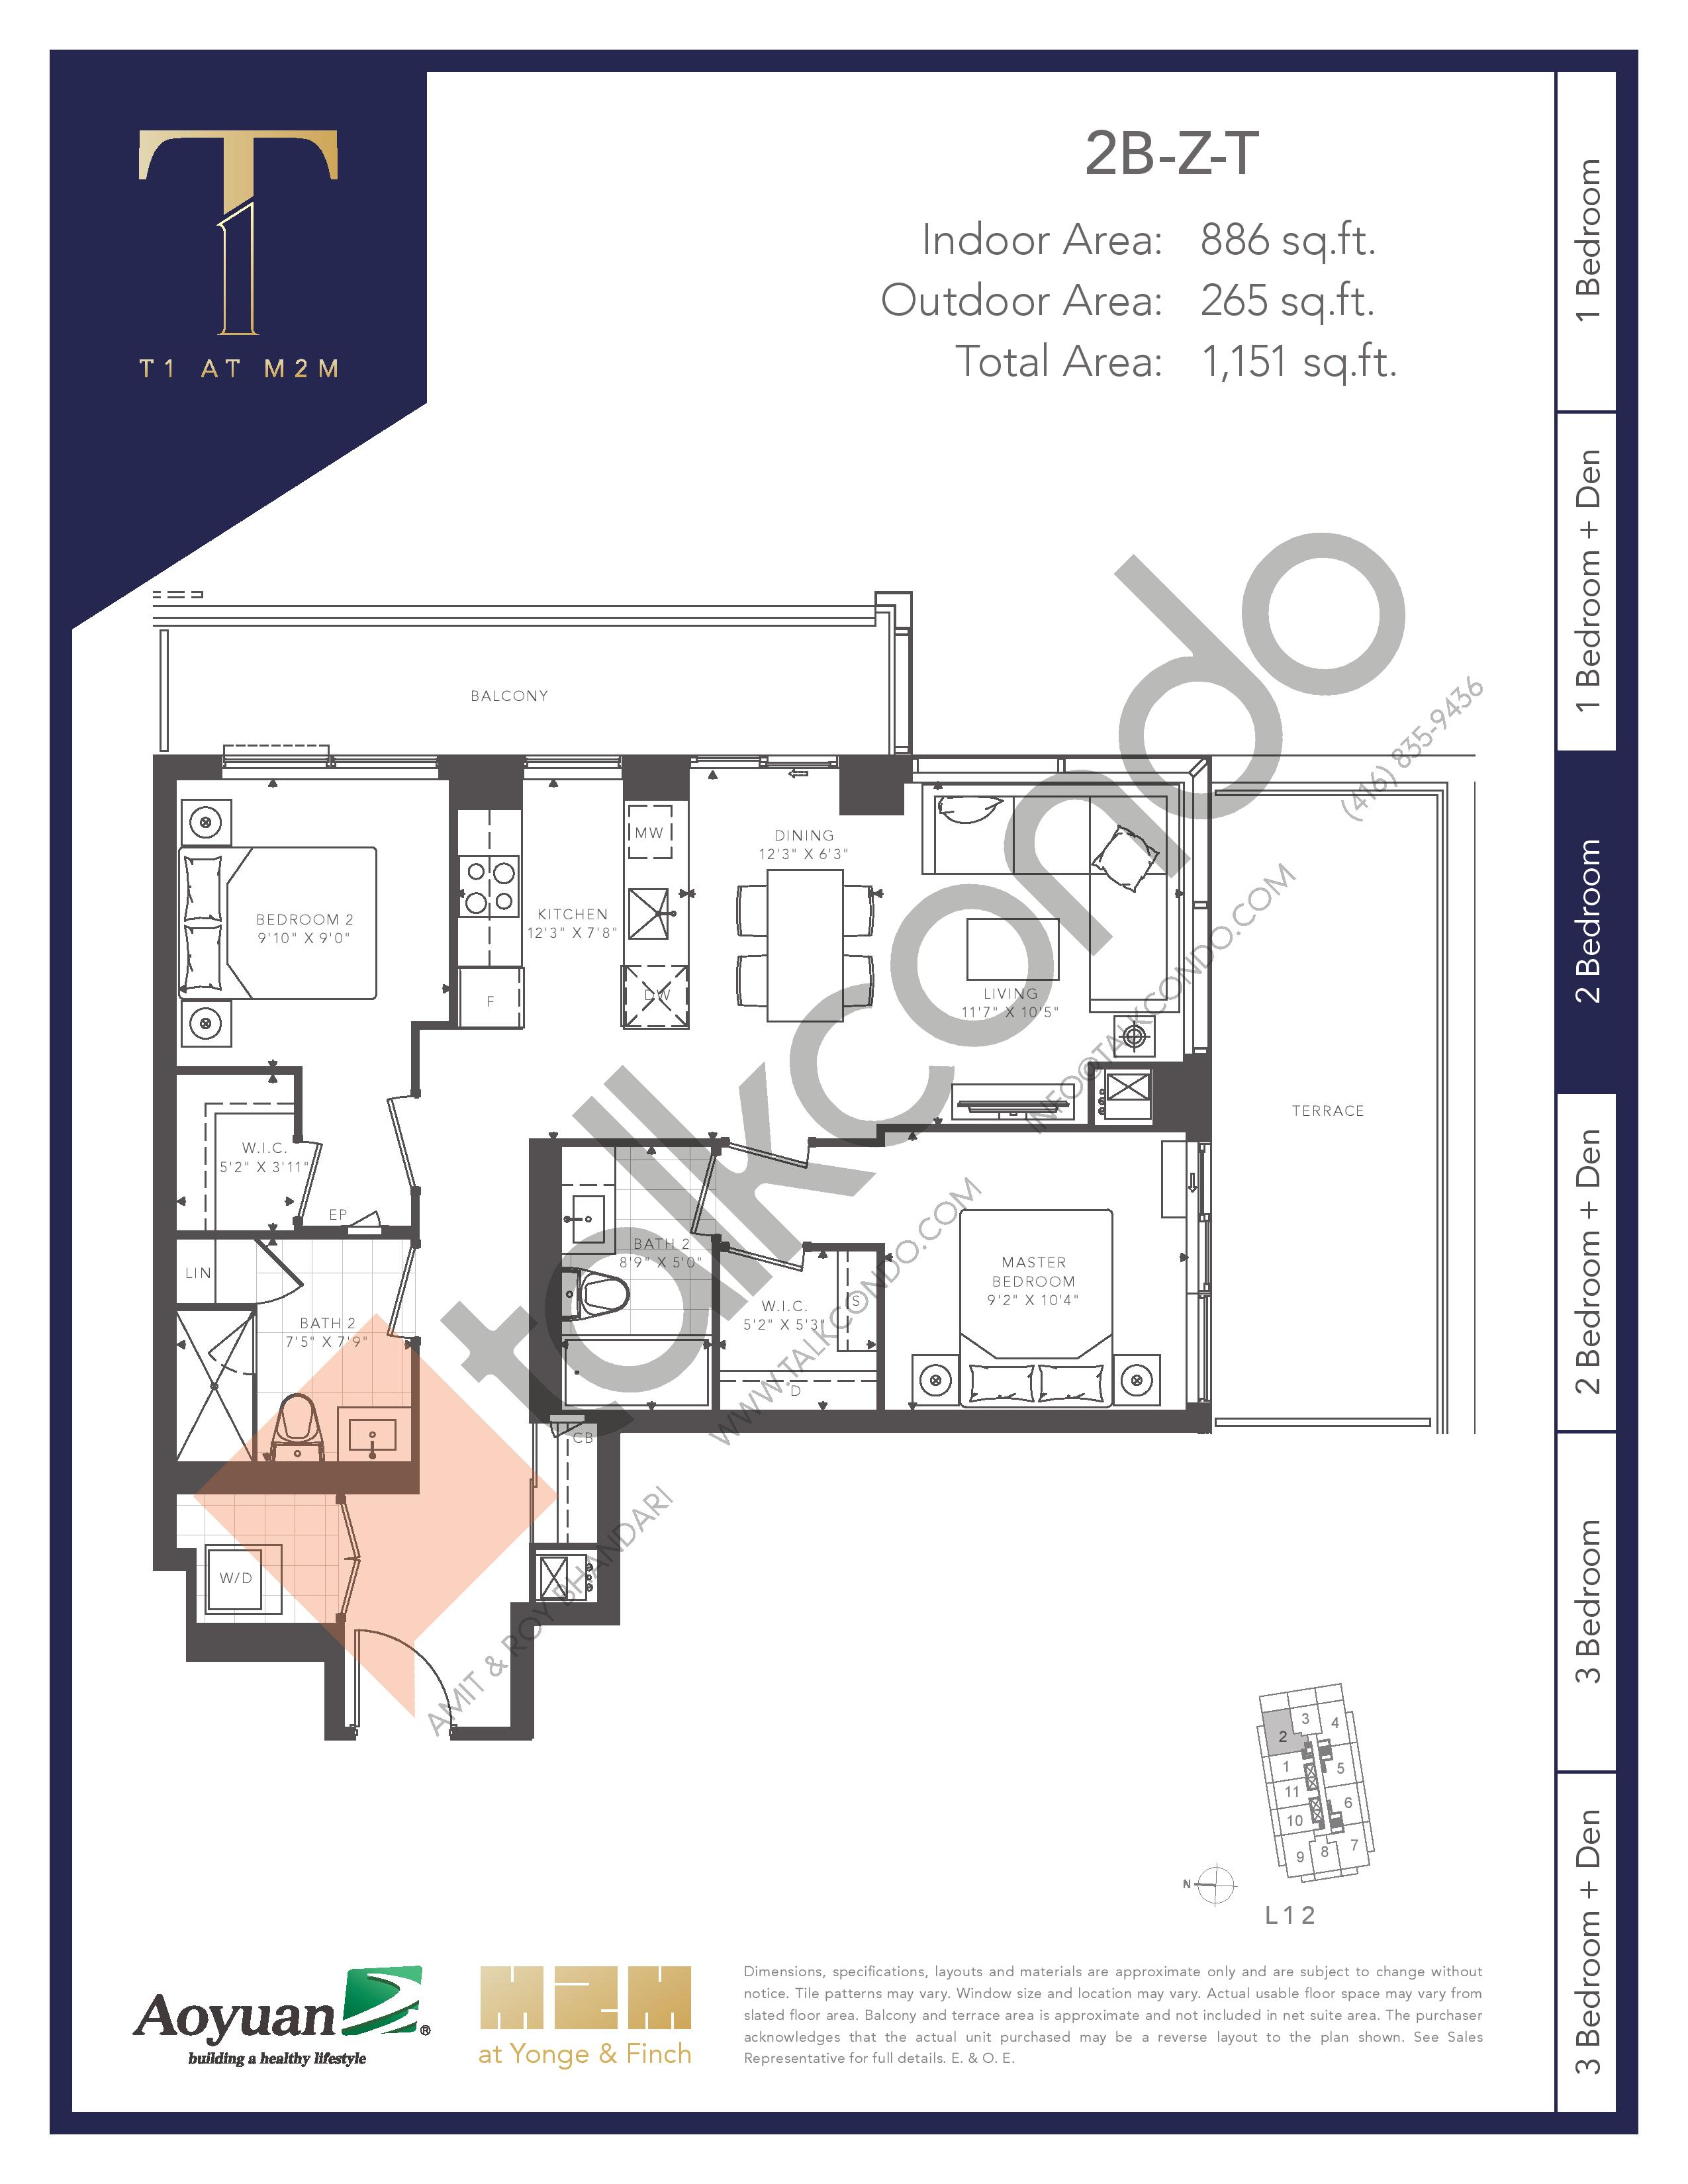 2B-Z-T (Tower) Floor Plan at T1 at M2M Condos - 886 sq.ft